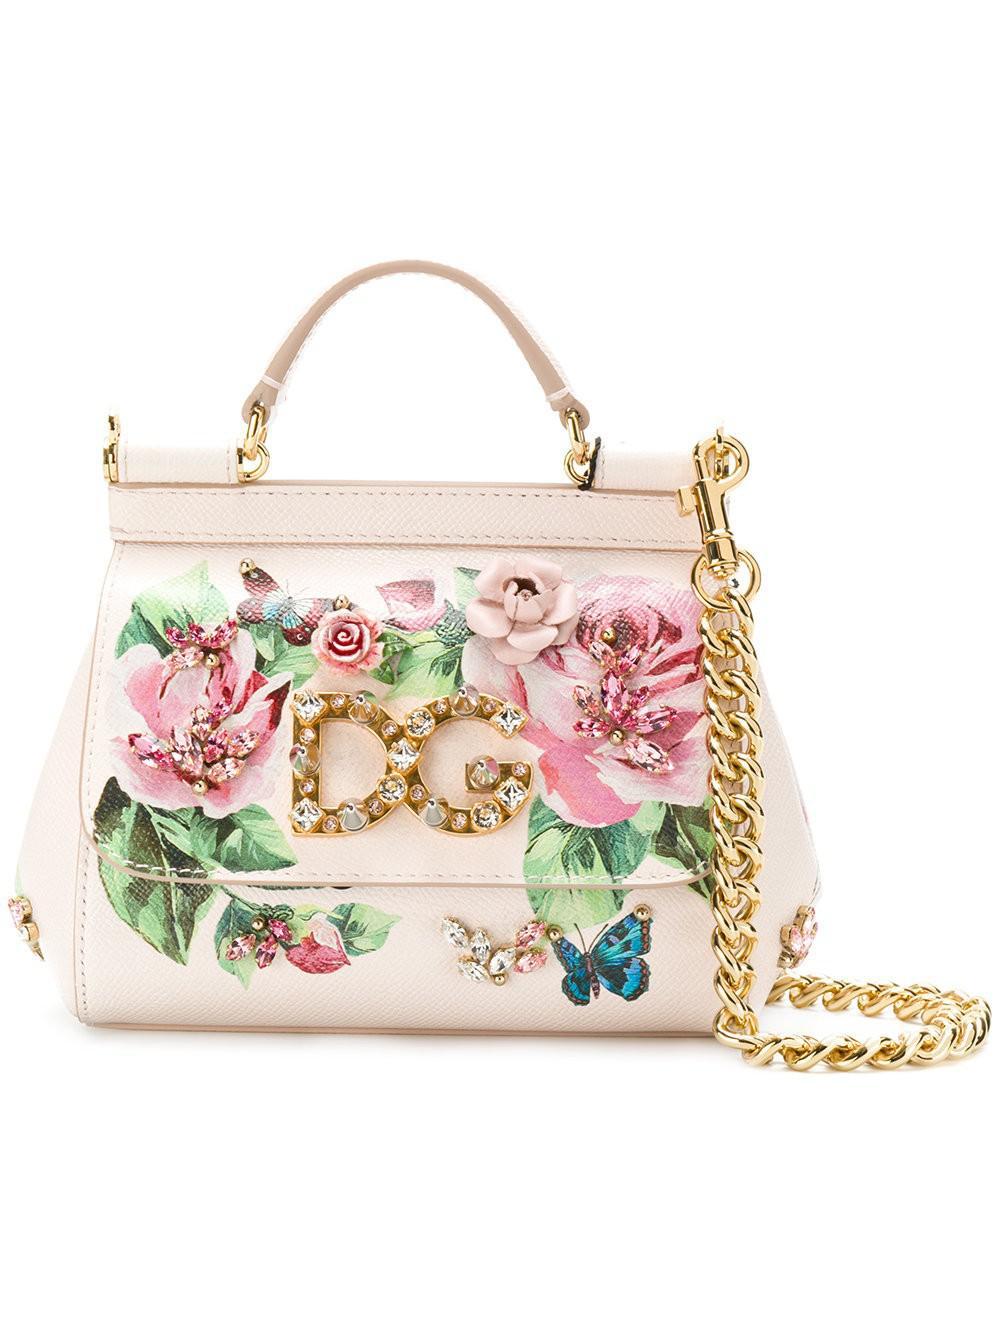 b04b4d75e3d1 Dolce   Gabbana Small Sicily Rose Print Bag - Lyst